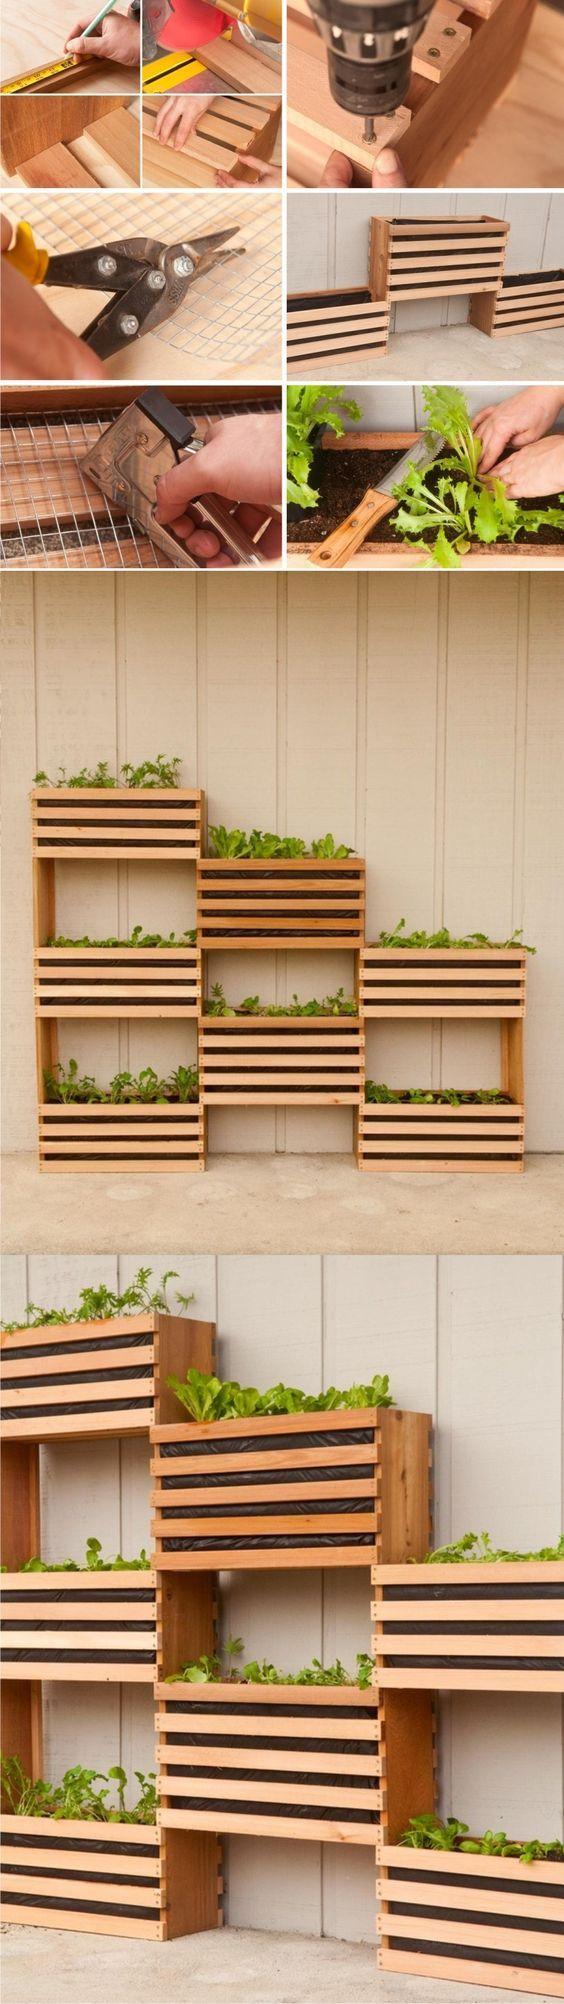 jardin vertical DIY muy ingenioso 2: | Para mi casa | Pinterest ...